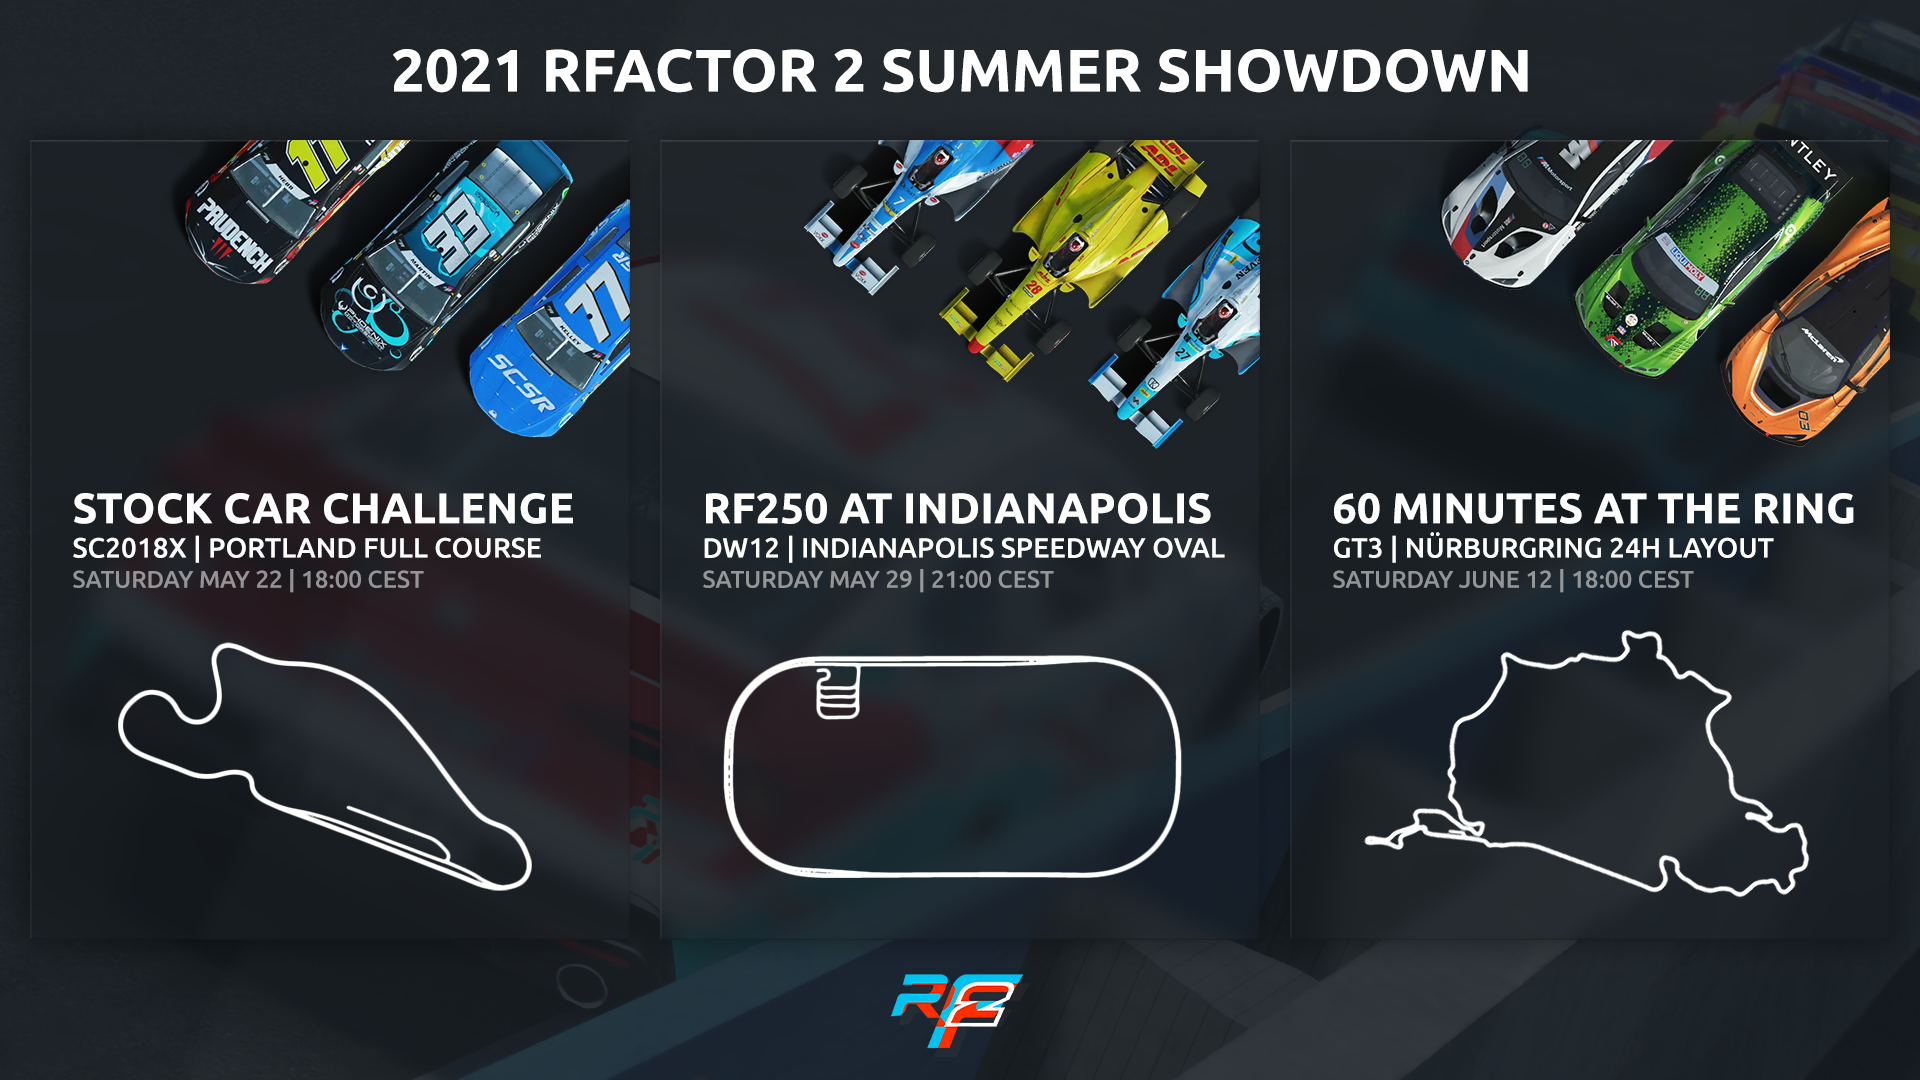 rFactor-2-summer-showdown-poster.png